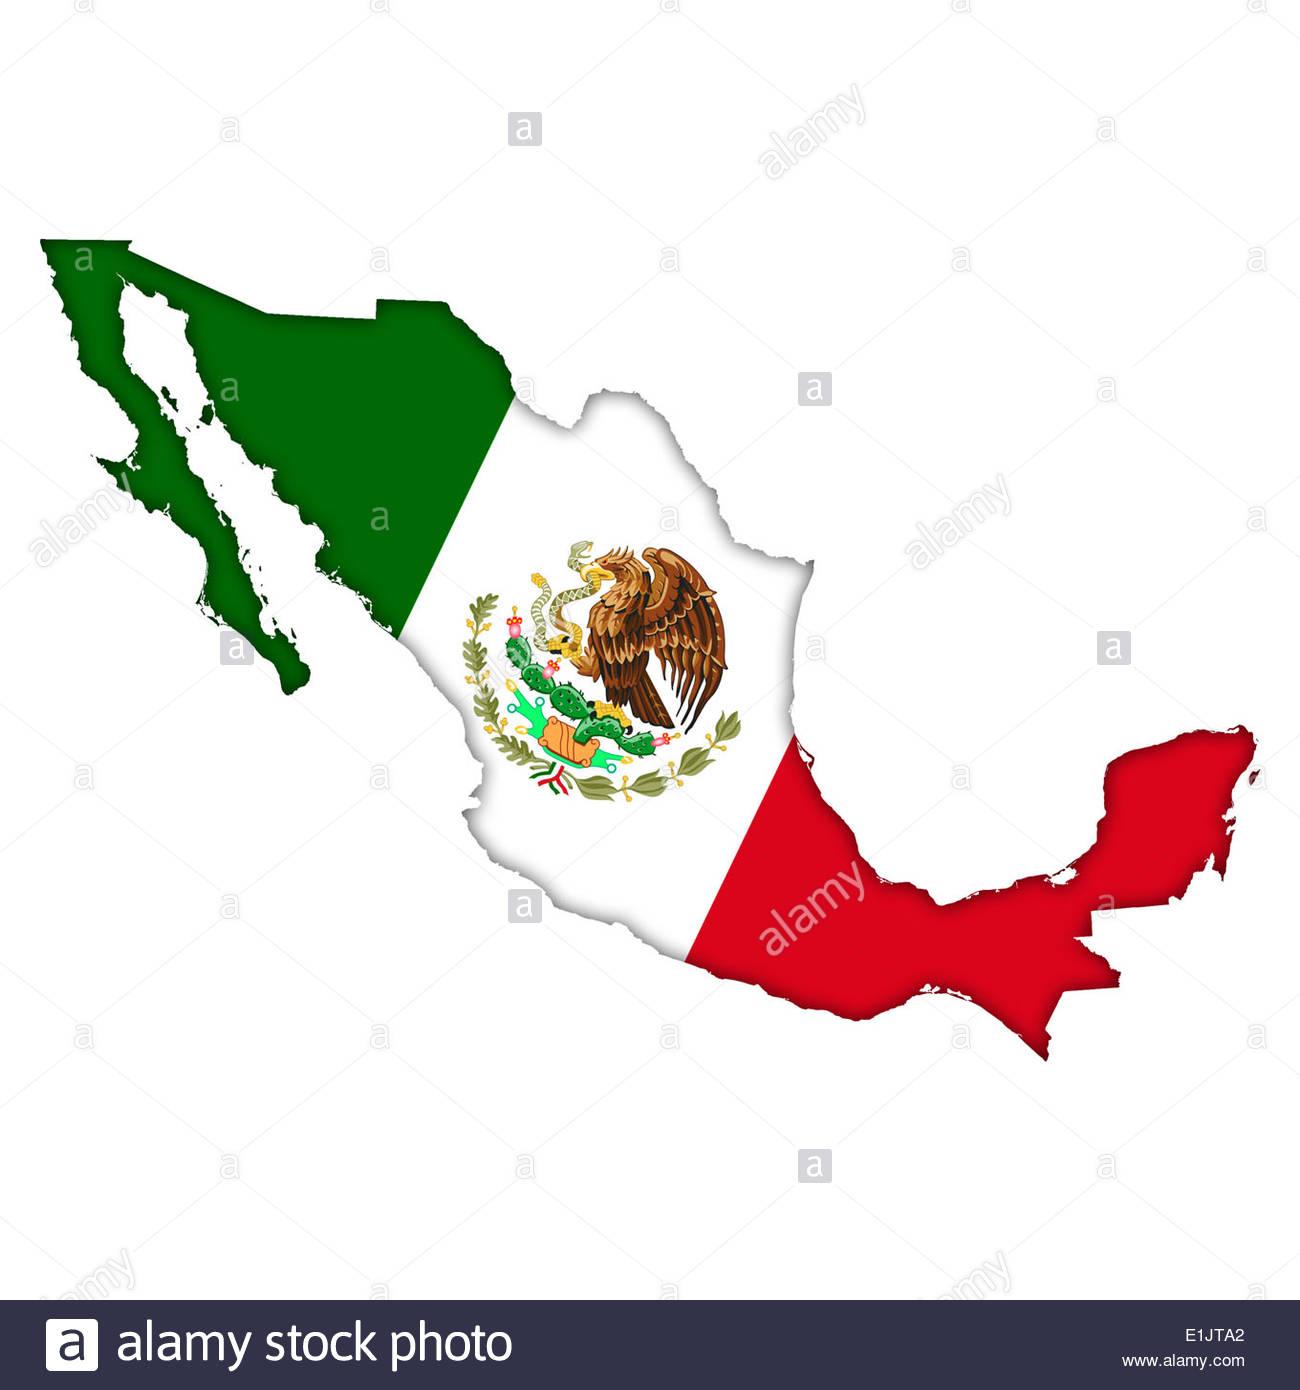 Mexico flag map icon logo - Stock Image